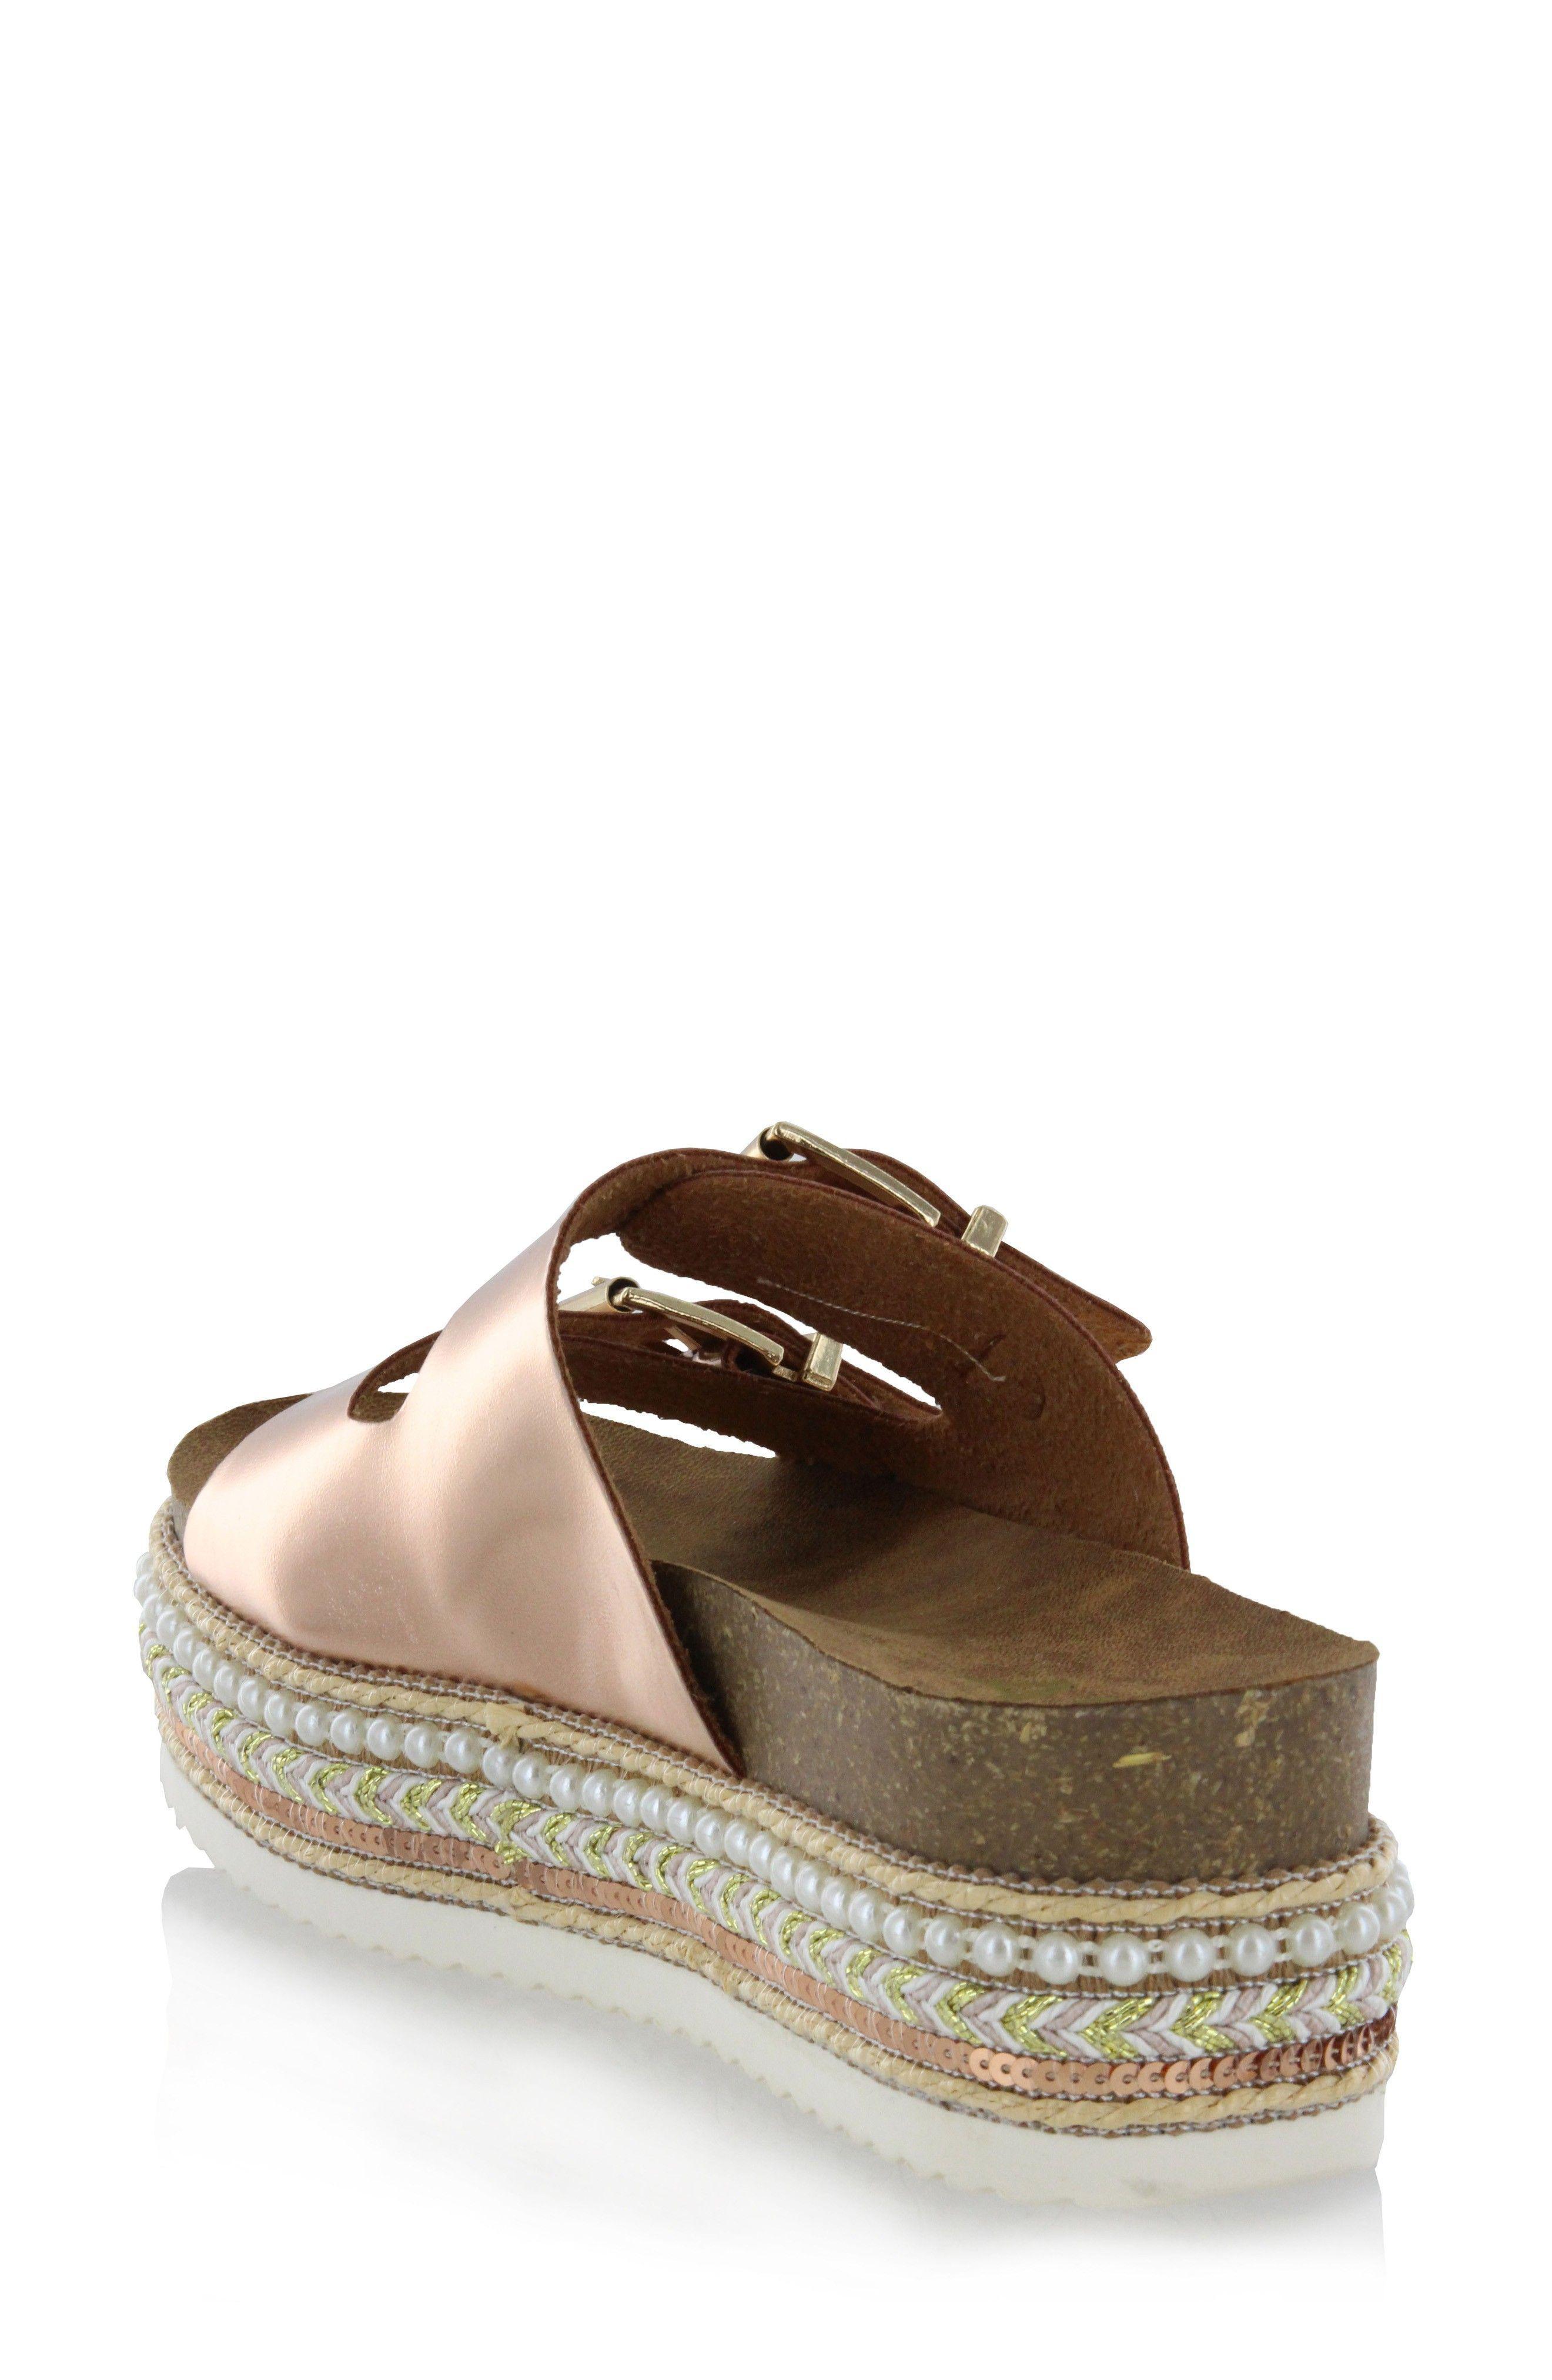 ad9b10fa372 Lyst - Mia Womens Topaz Open Toe Casual Platform Sandals